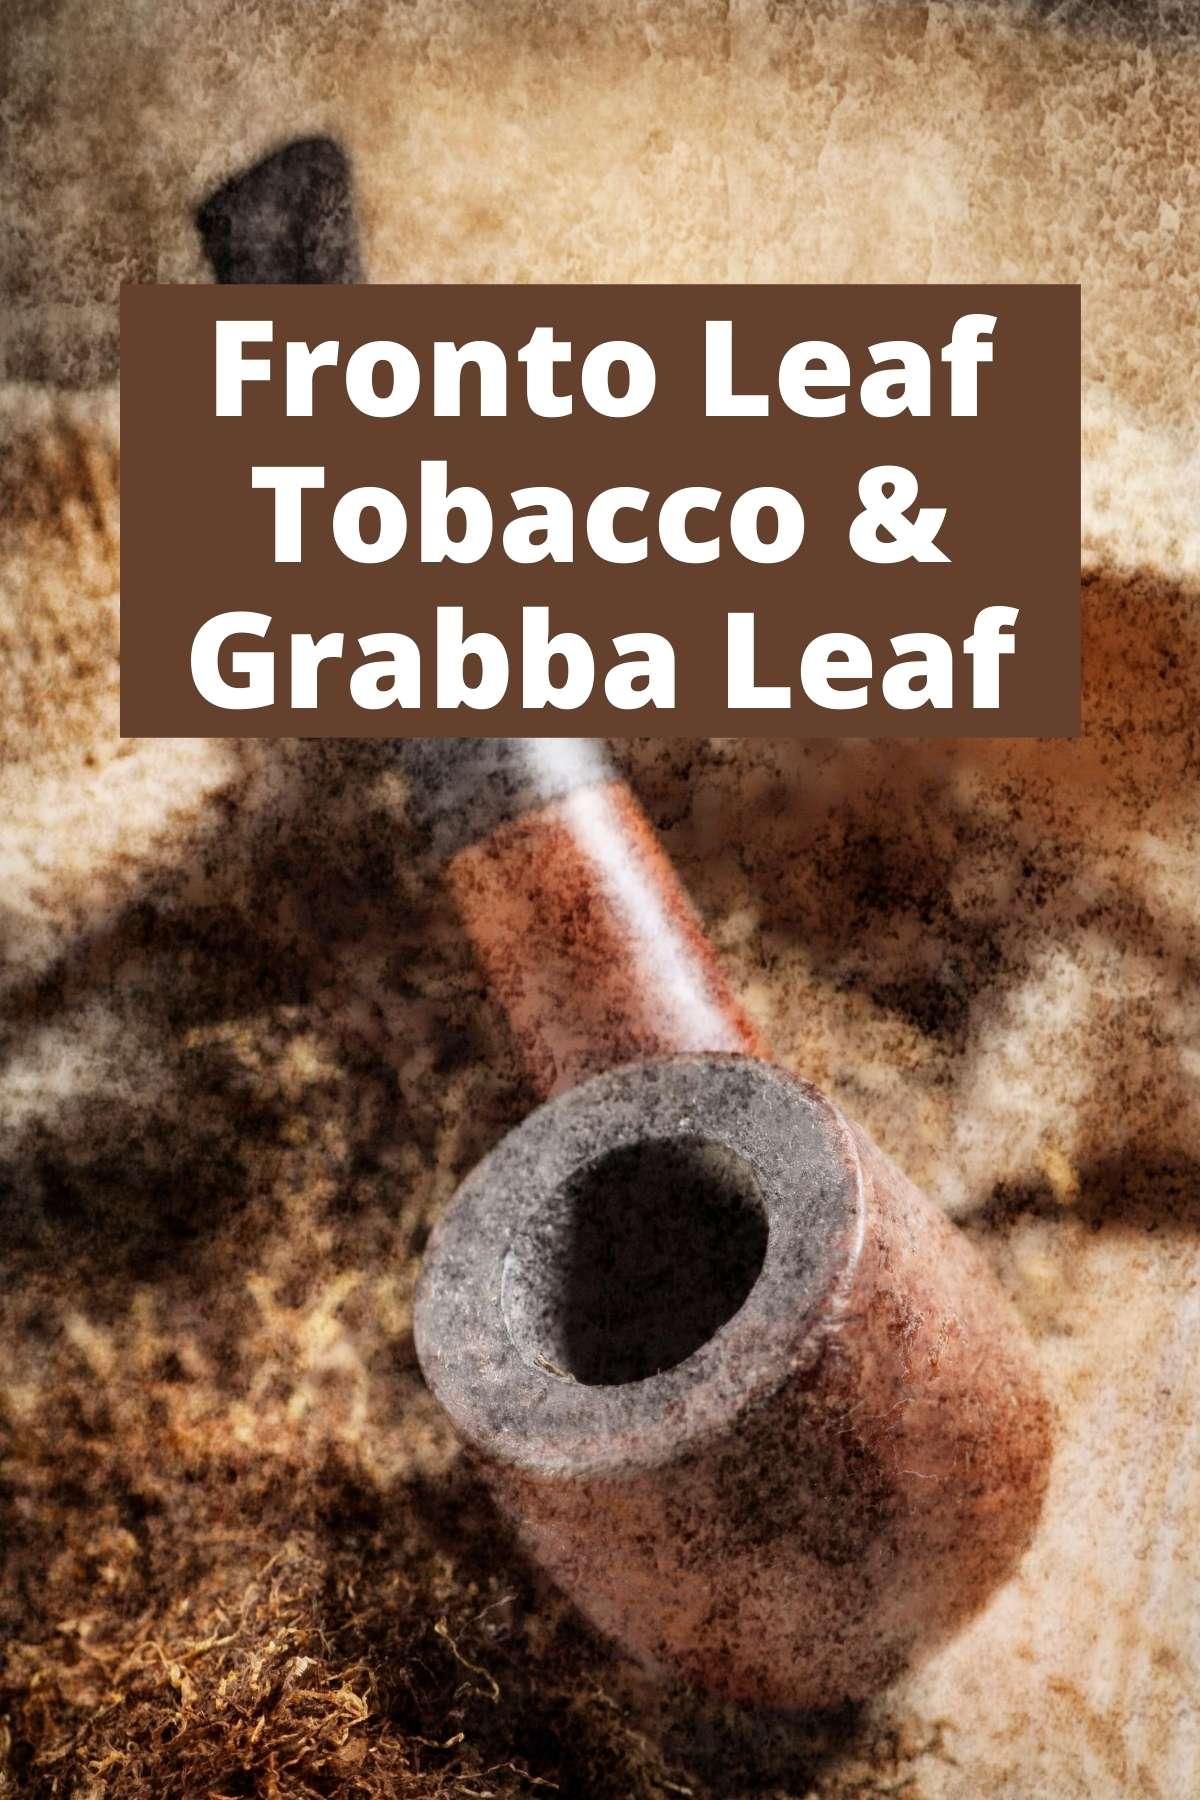 Fronto Leaf Tobacco and Grabba Leaf